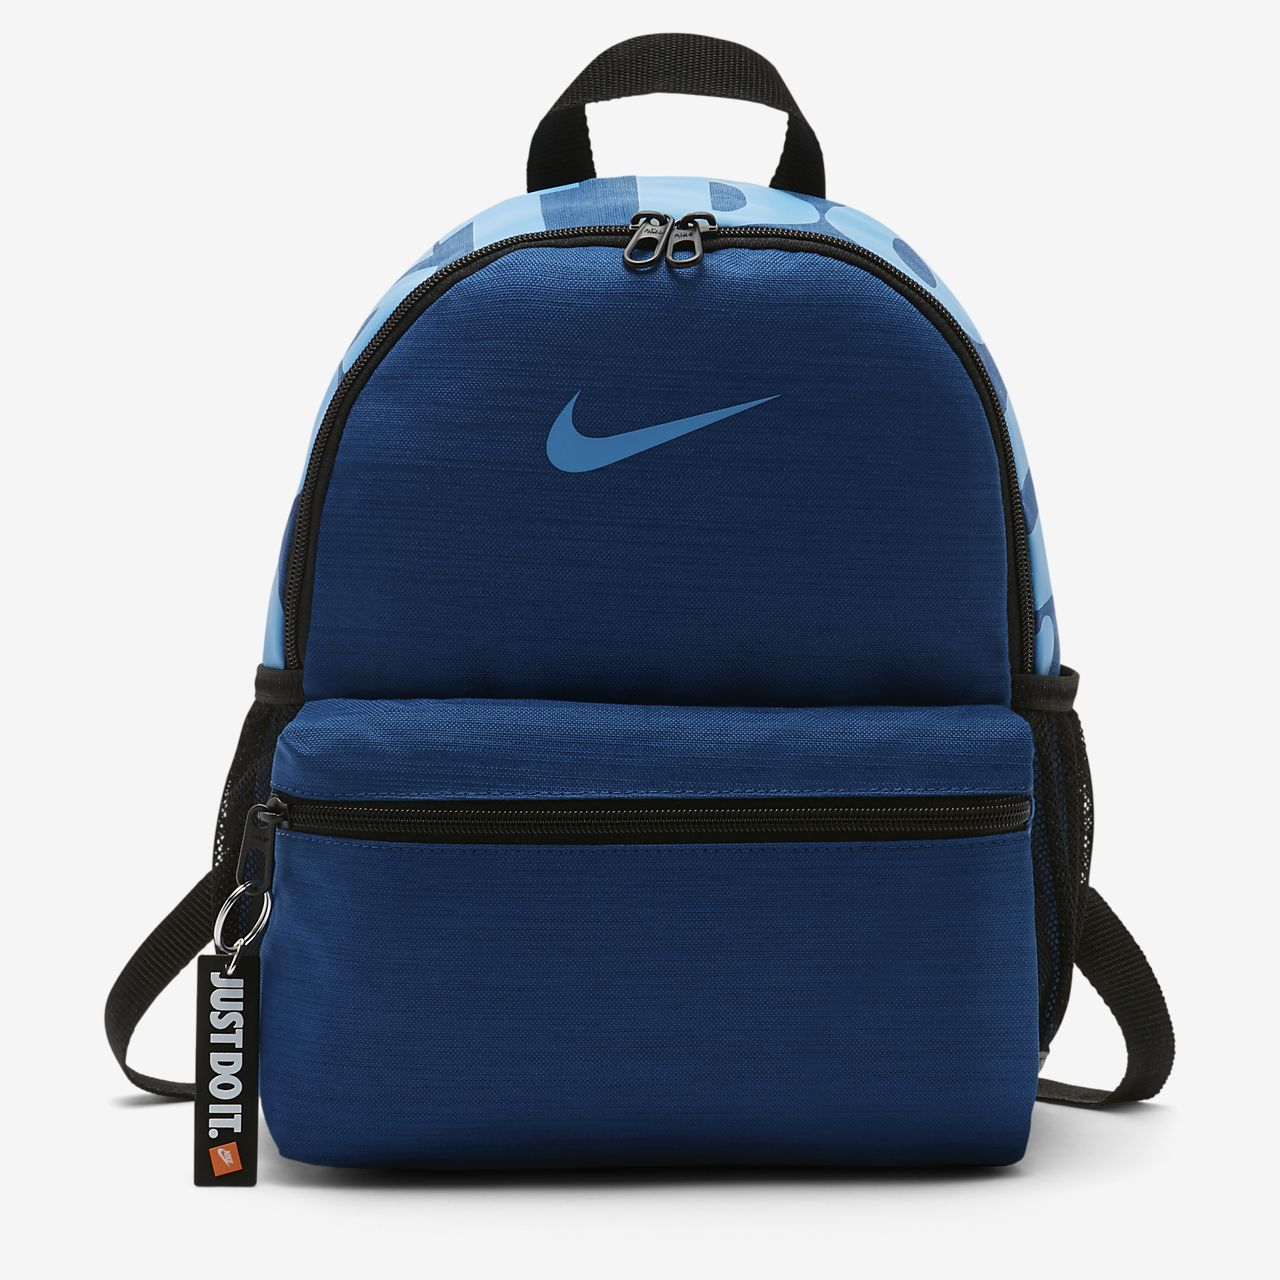 1ff5f5d33abe Nike Brasilia Just Do It Kids  Backpack (Mini). Nike.com CH